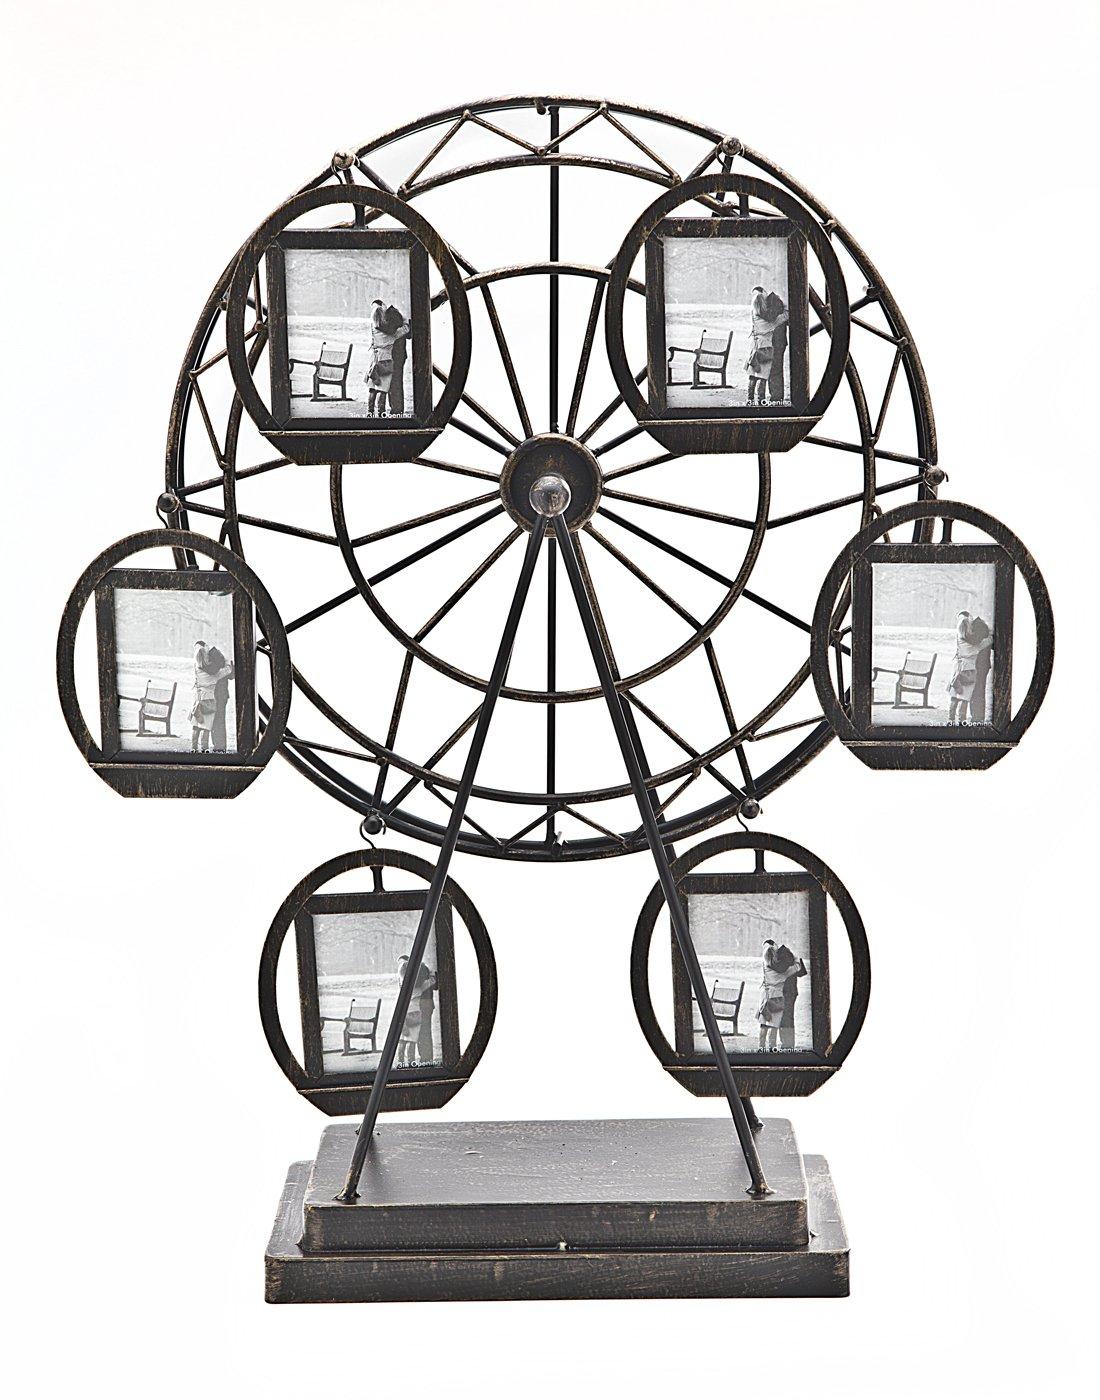 Amazon.com - Philip Whitney Rotating Ferris Wheel Six 2x3 Picture ...